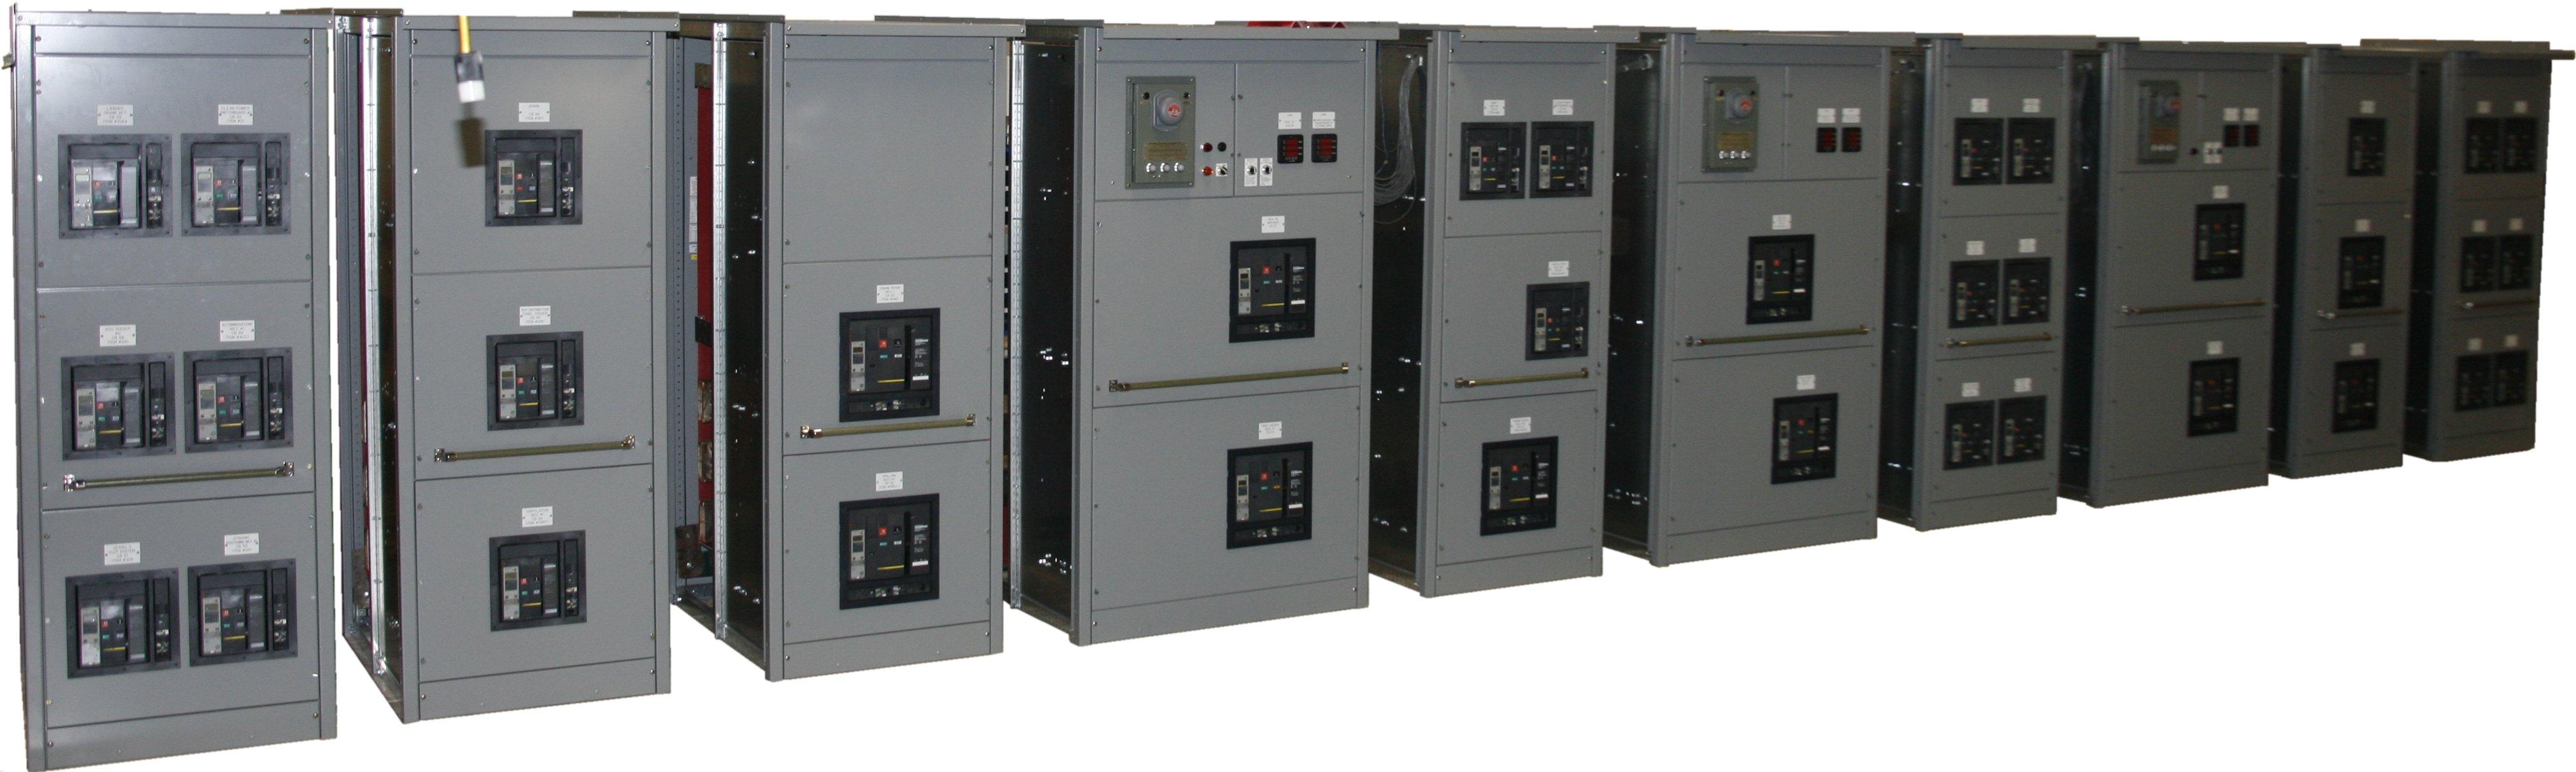 Lovely 600 Volt AC Switchboard For Frontier Drillingu0027s Frontier Driller Offshore  Oil Rig.